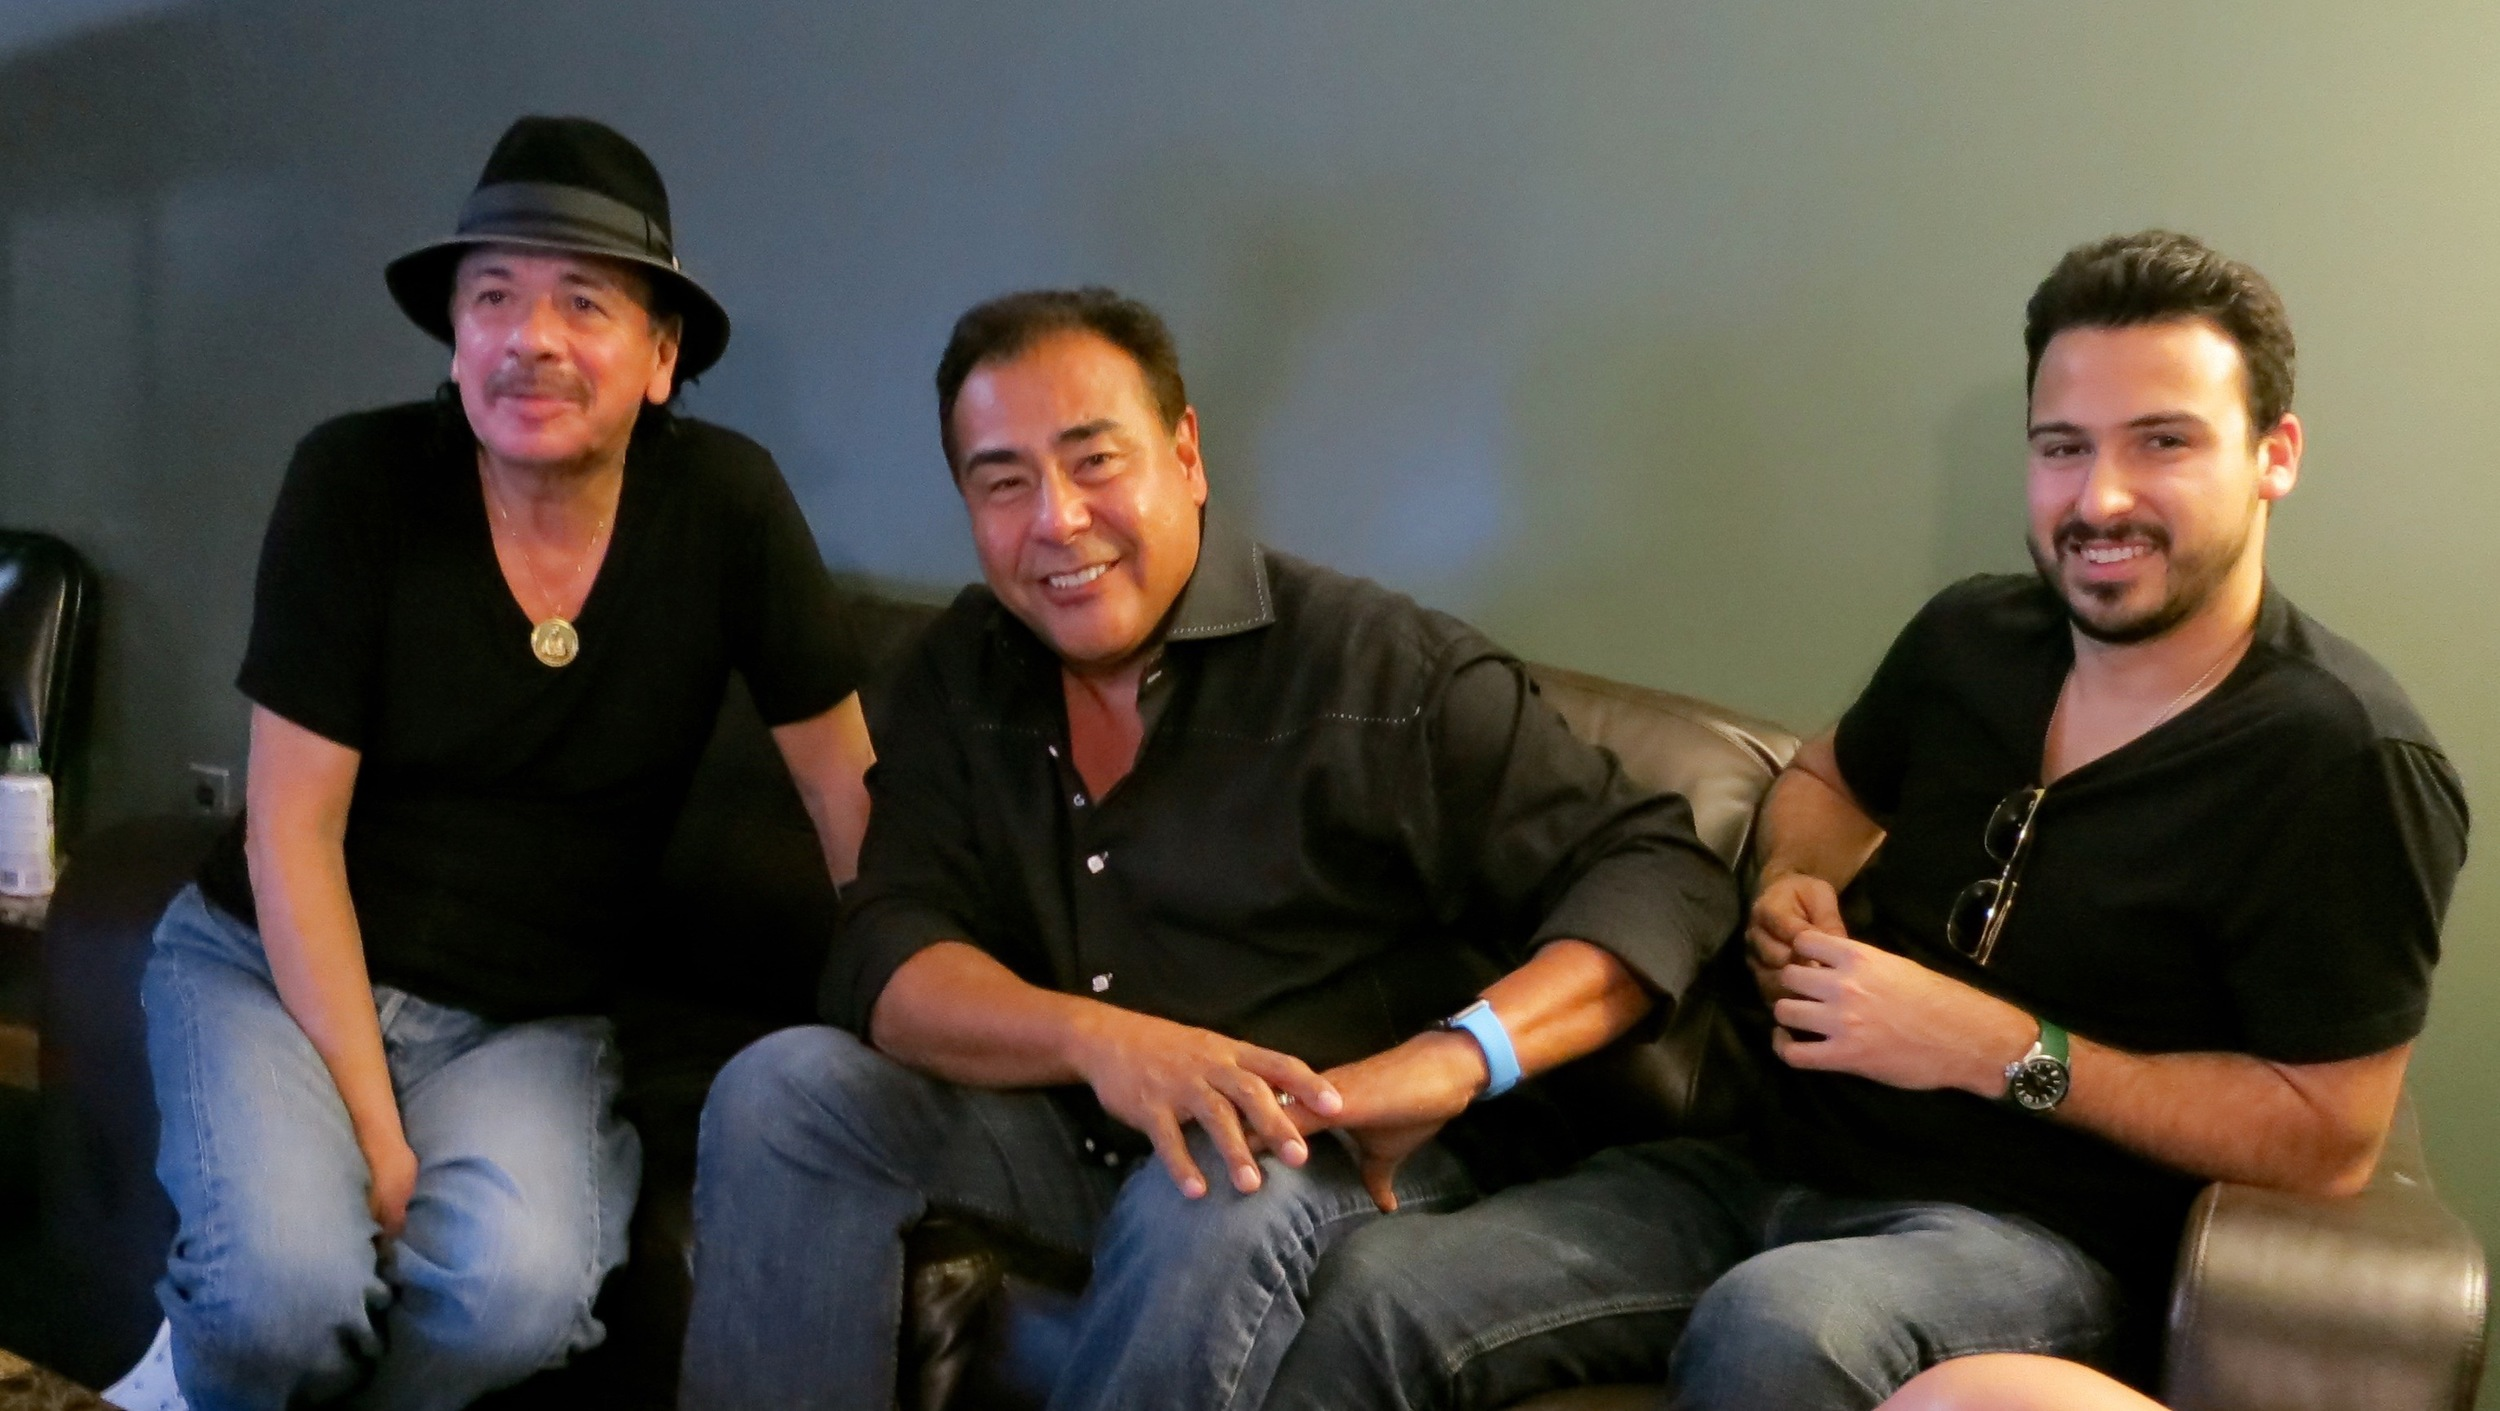 With Carlos Santana and Julian Quiñones